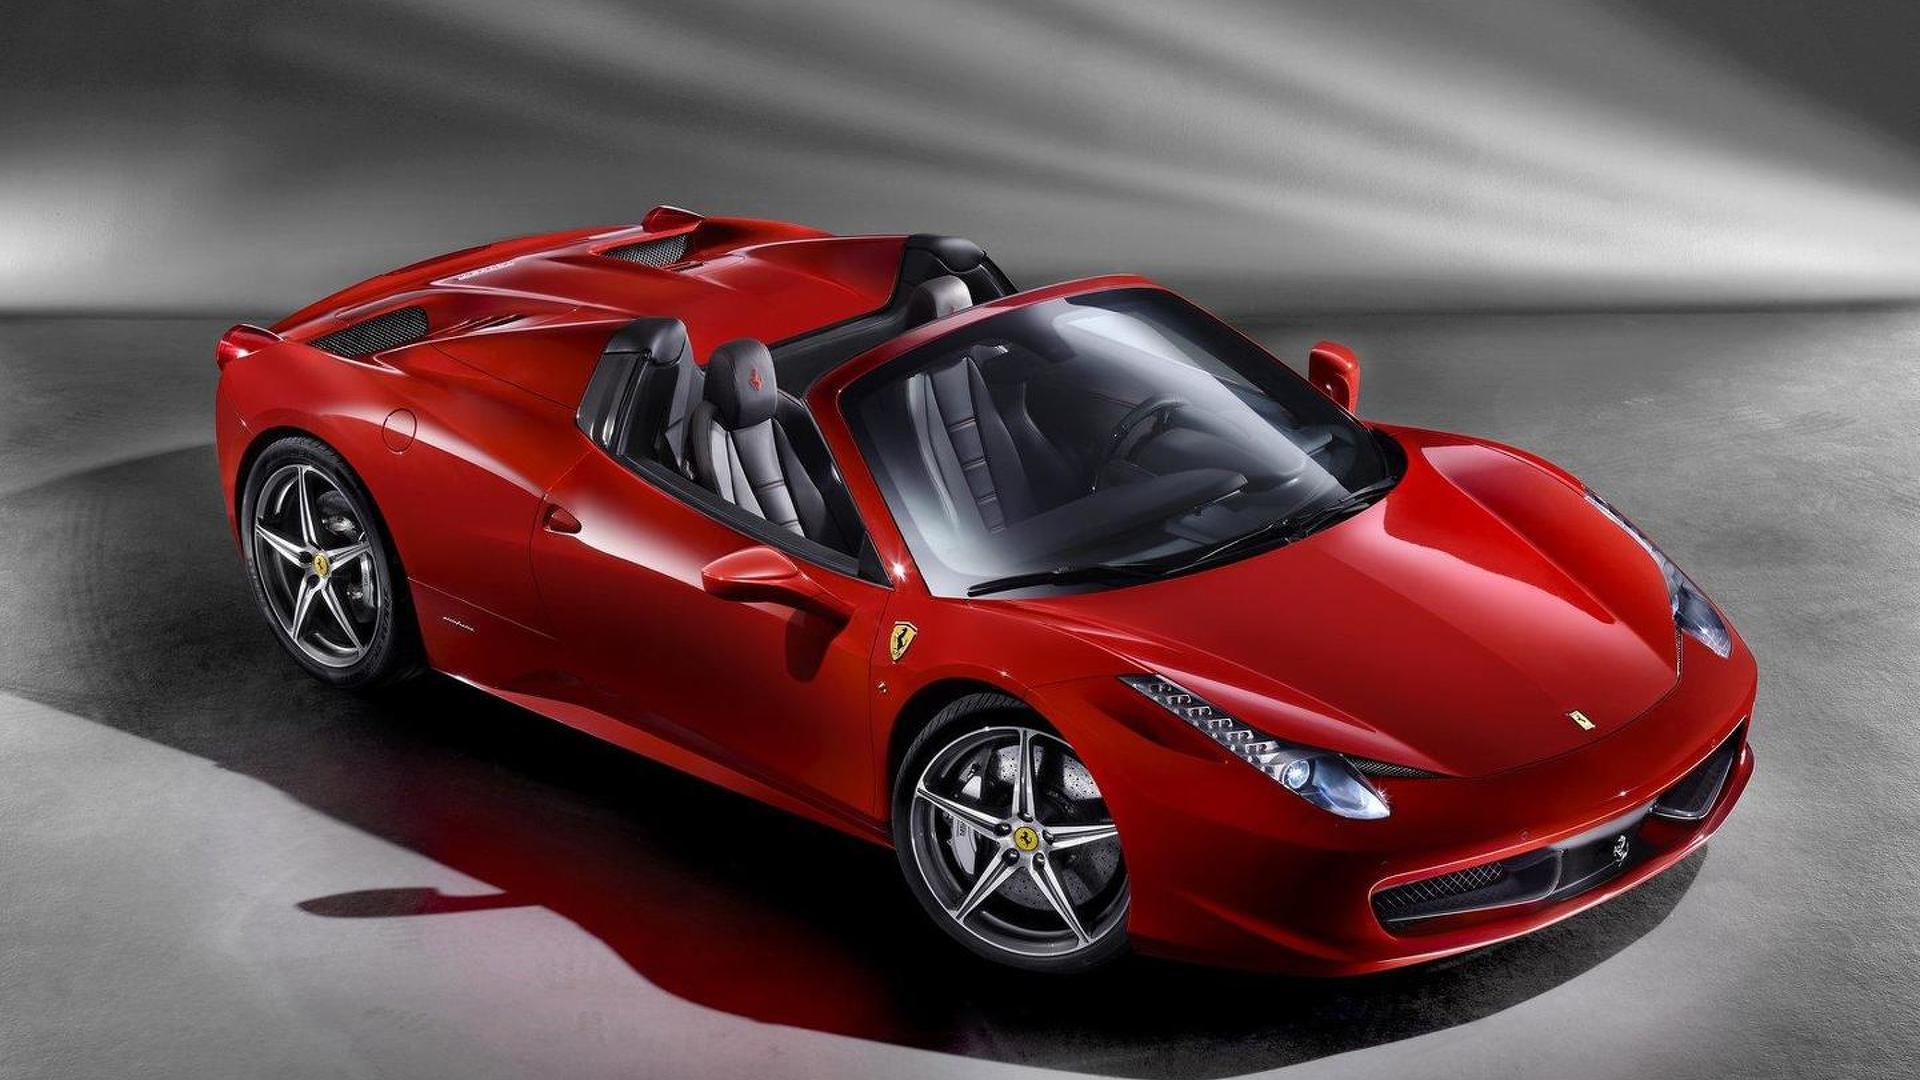 am race drag trends much ferrari veyron laferrari shot video does at bugatti digital and cost screen it cars how